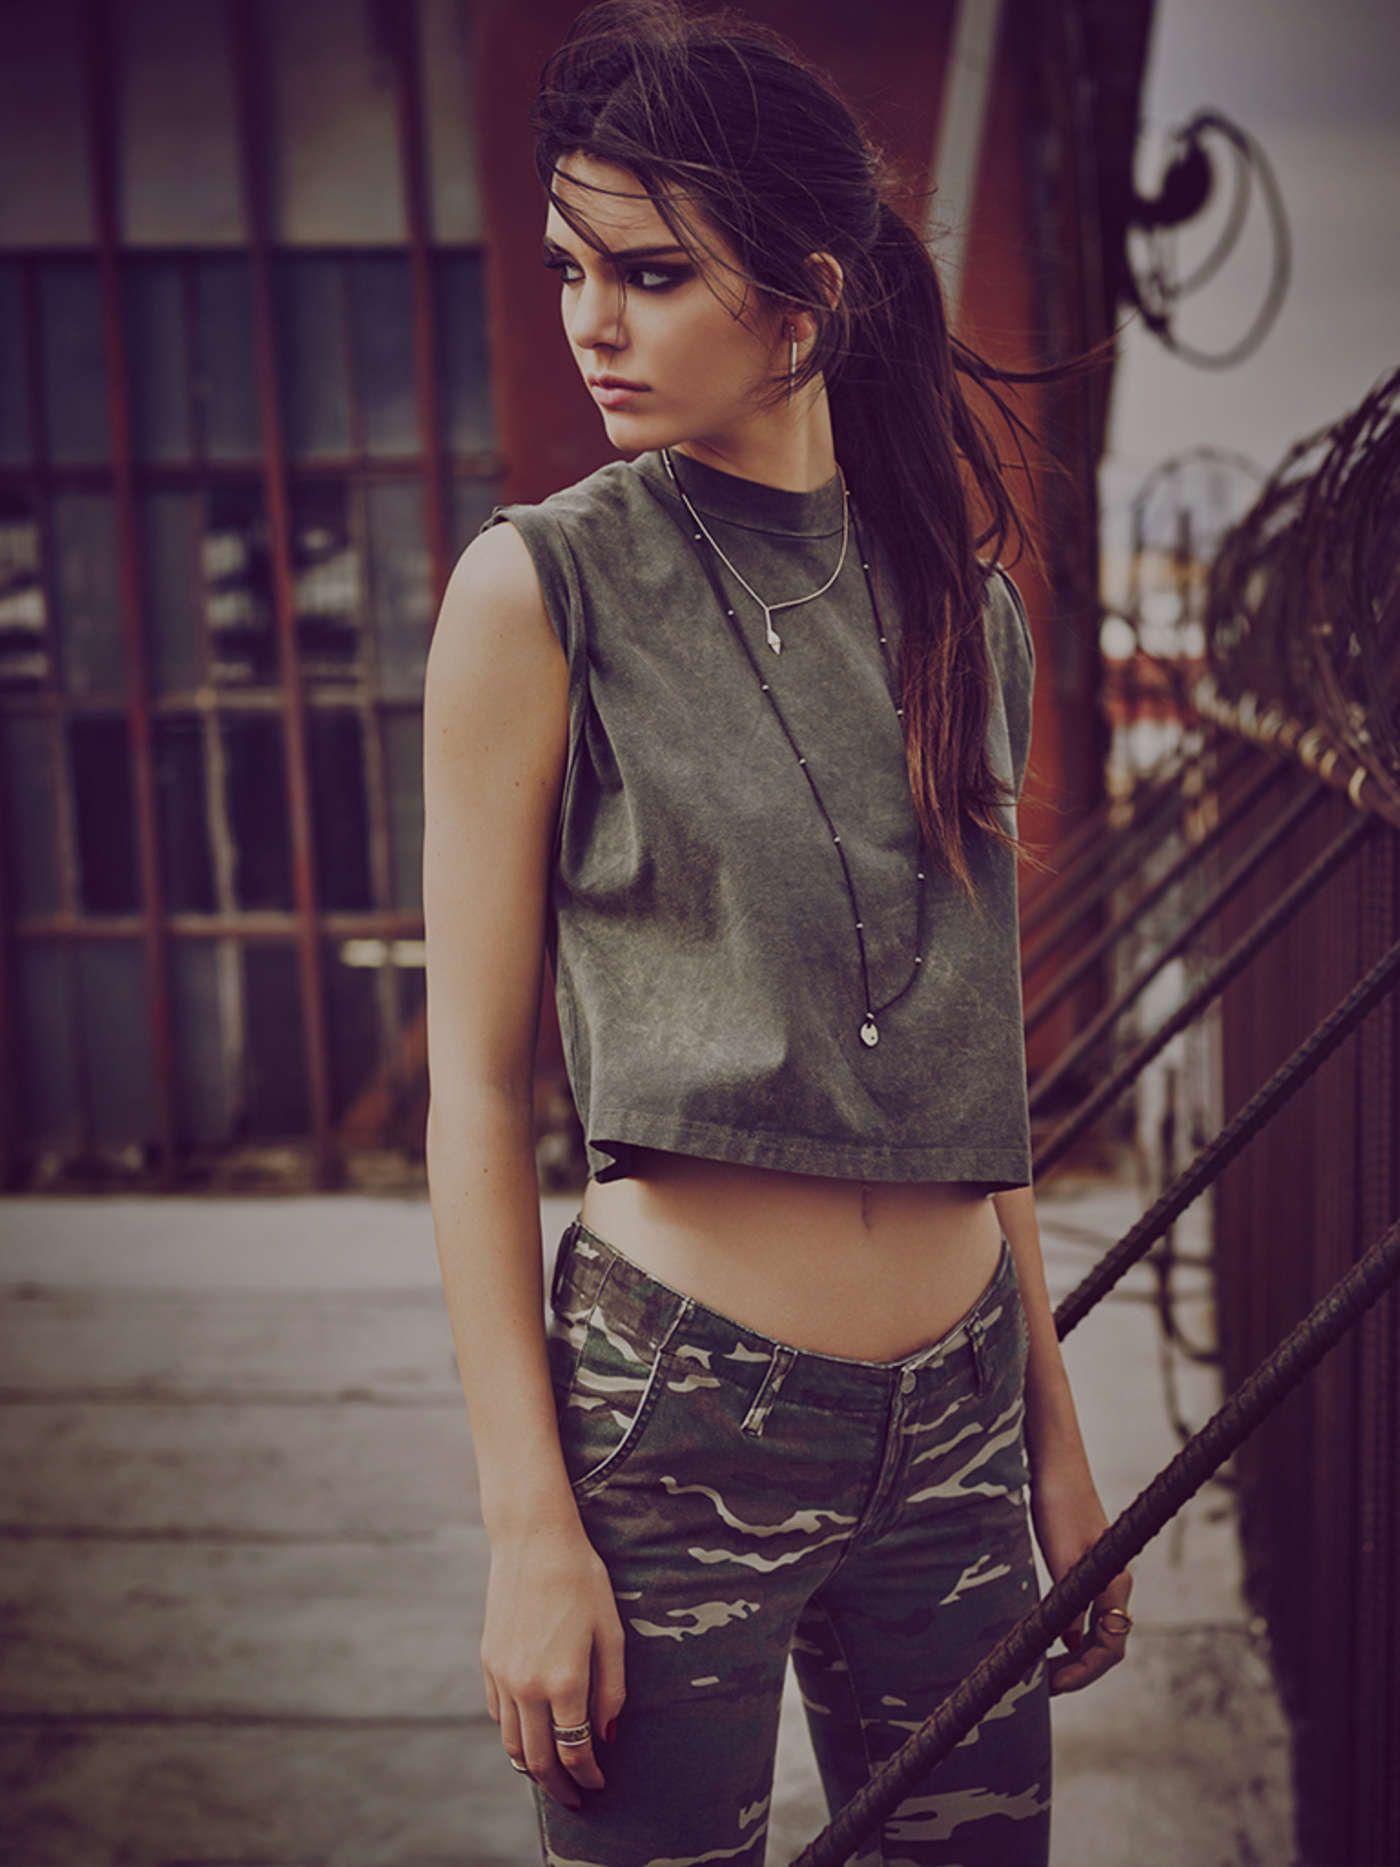 61baa7a963a Kendall Jenner - Penshoppe Urban Rebels Photoshoot 2015